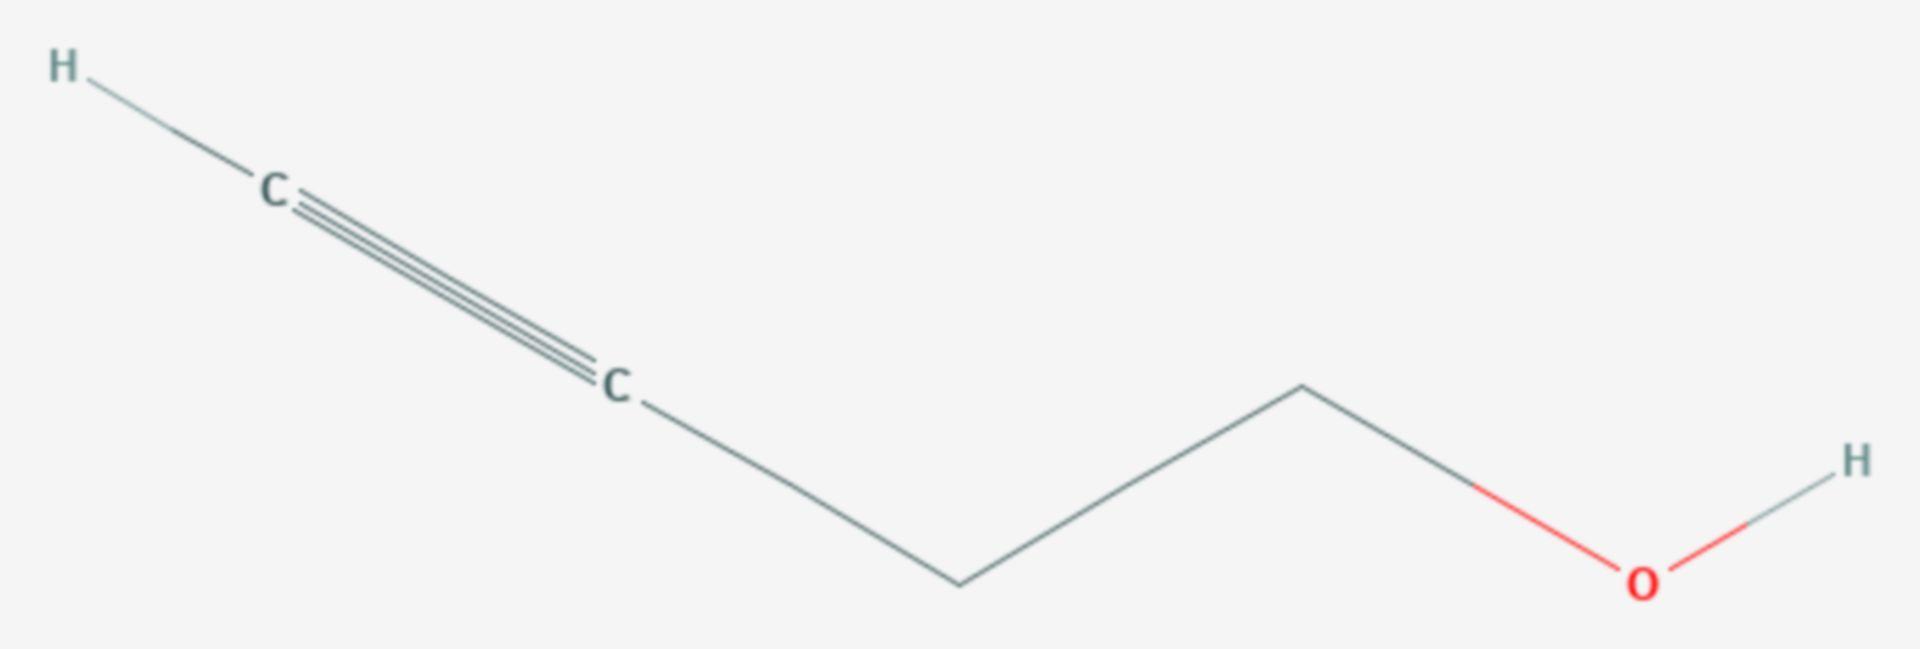 3-Butin-1-ol (Strukturformel)